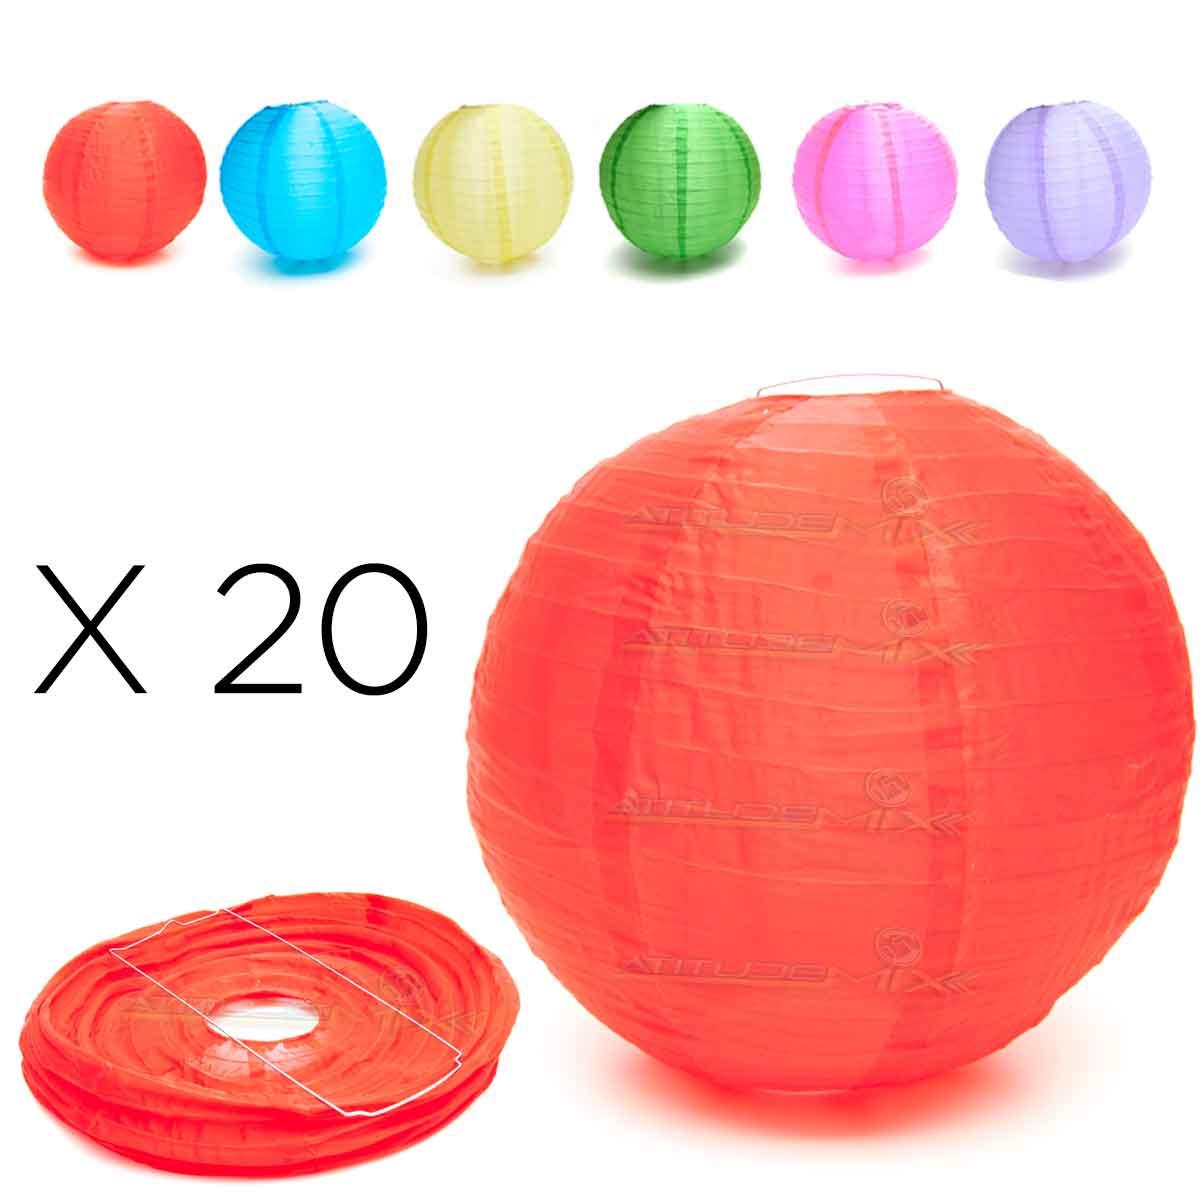 Kit 20 Luminária Japonesa Chinesa Oriental Tecido Nylon